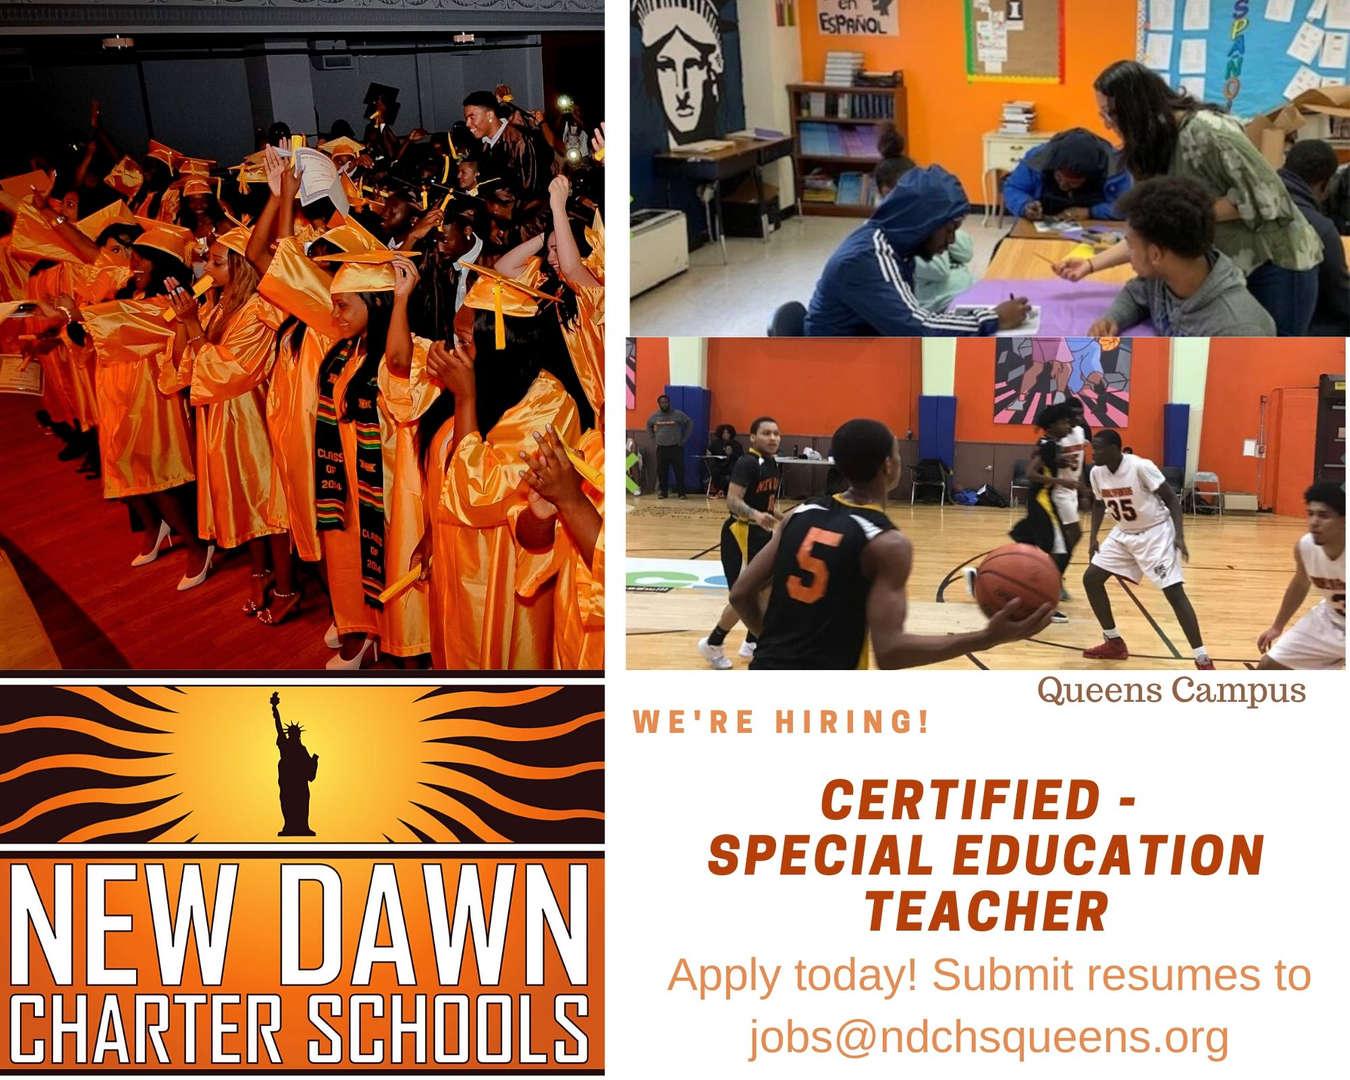 Certified - Special Education Teacher